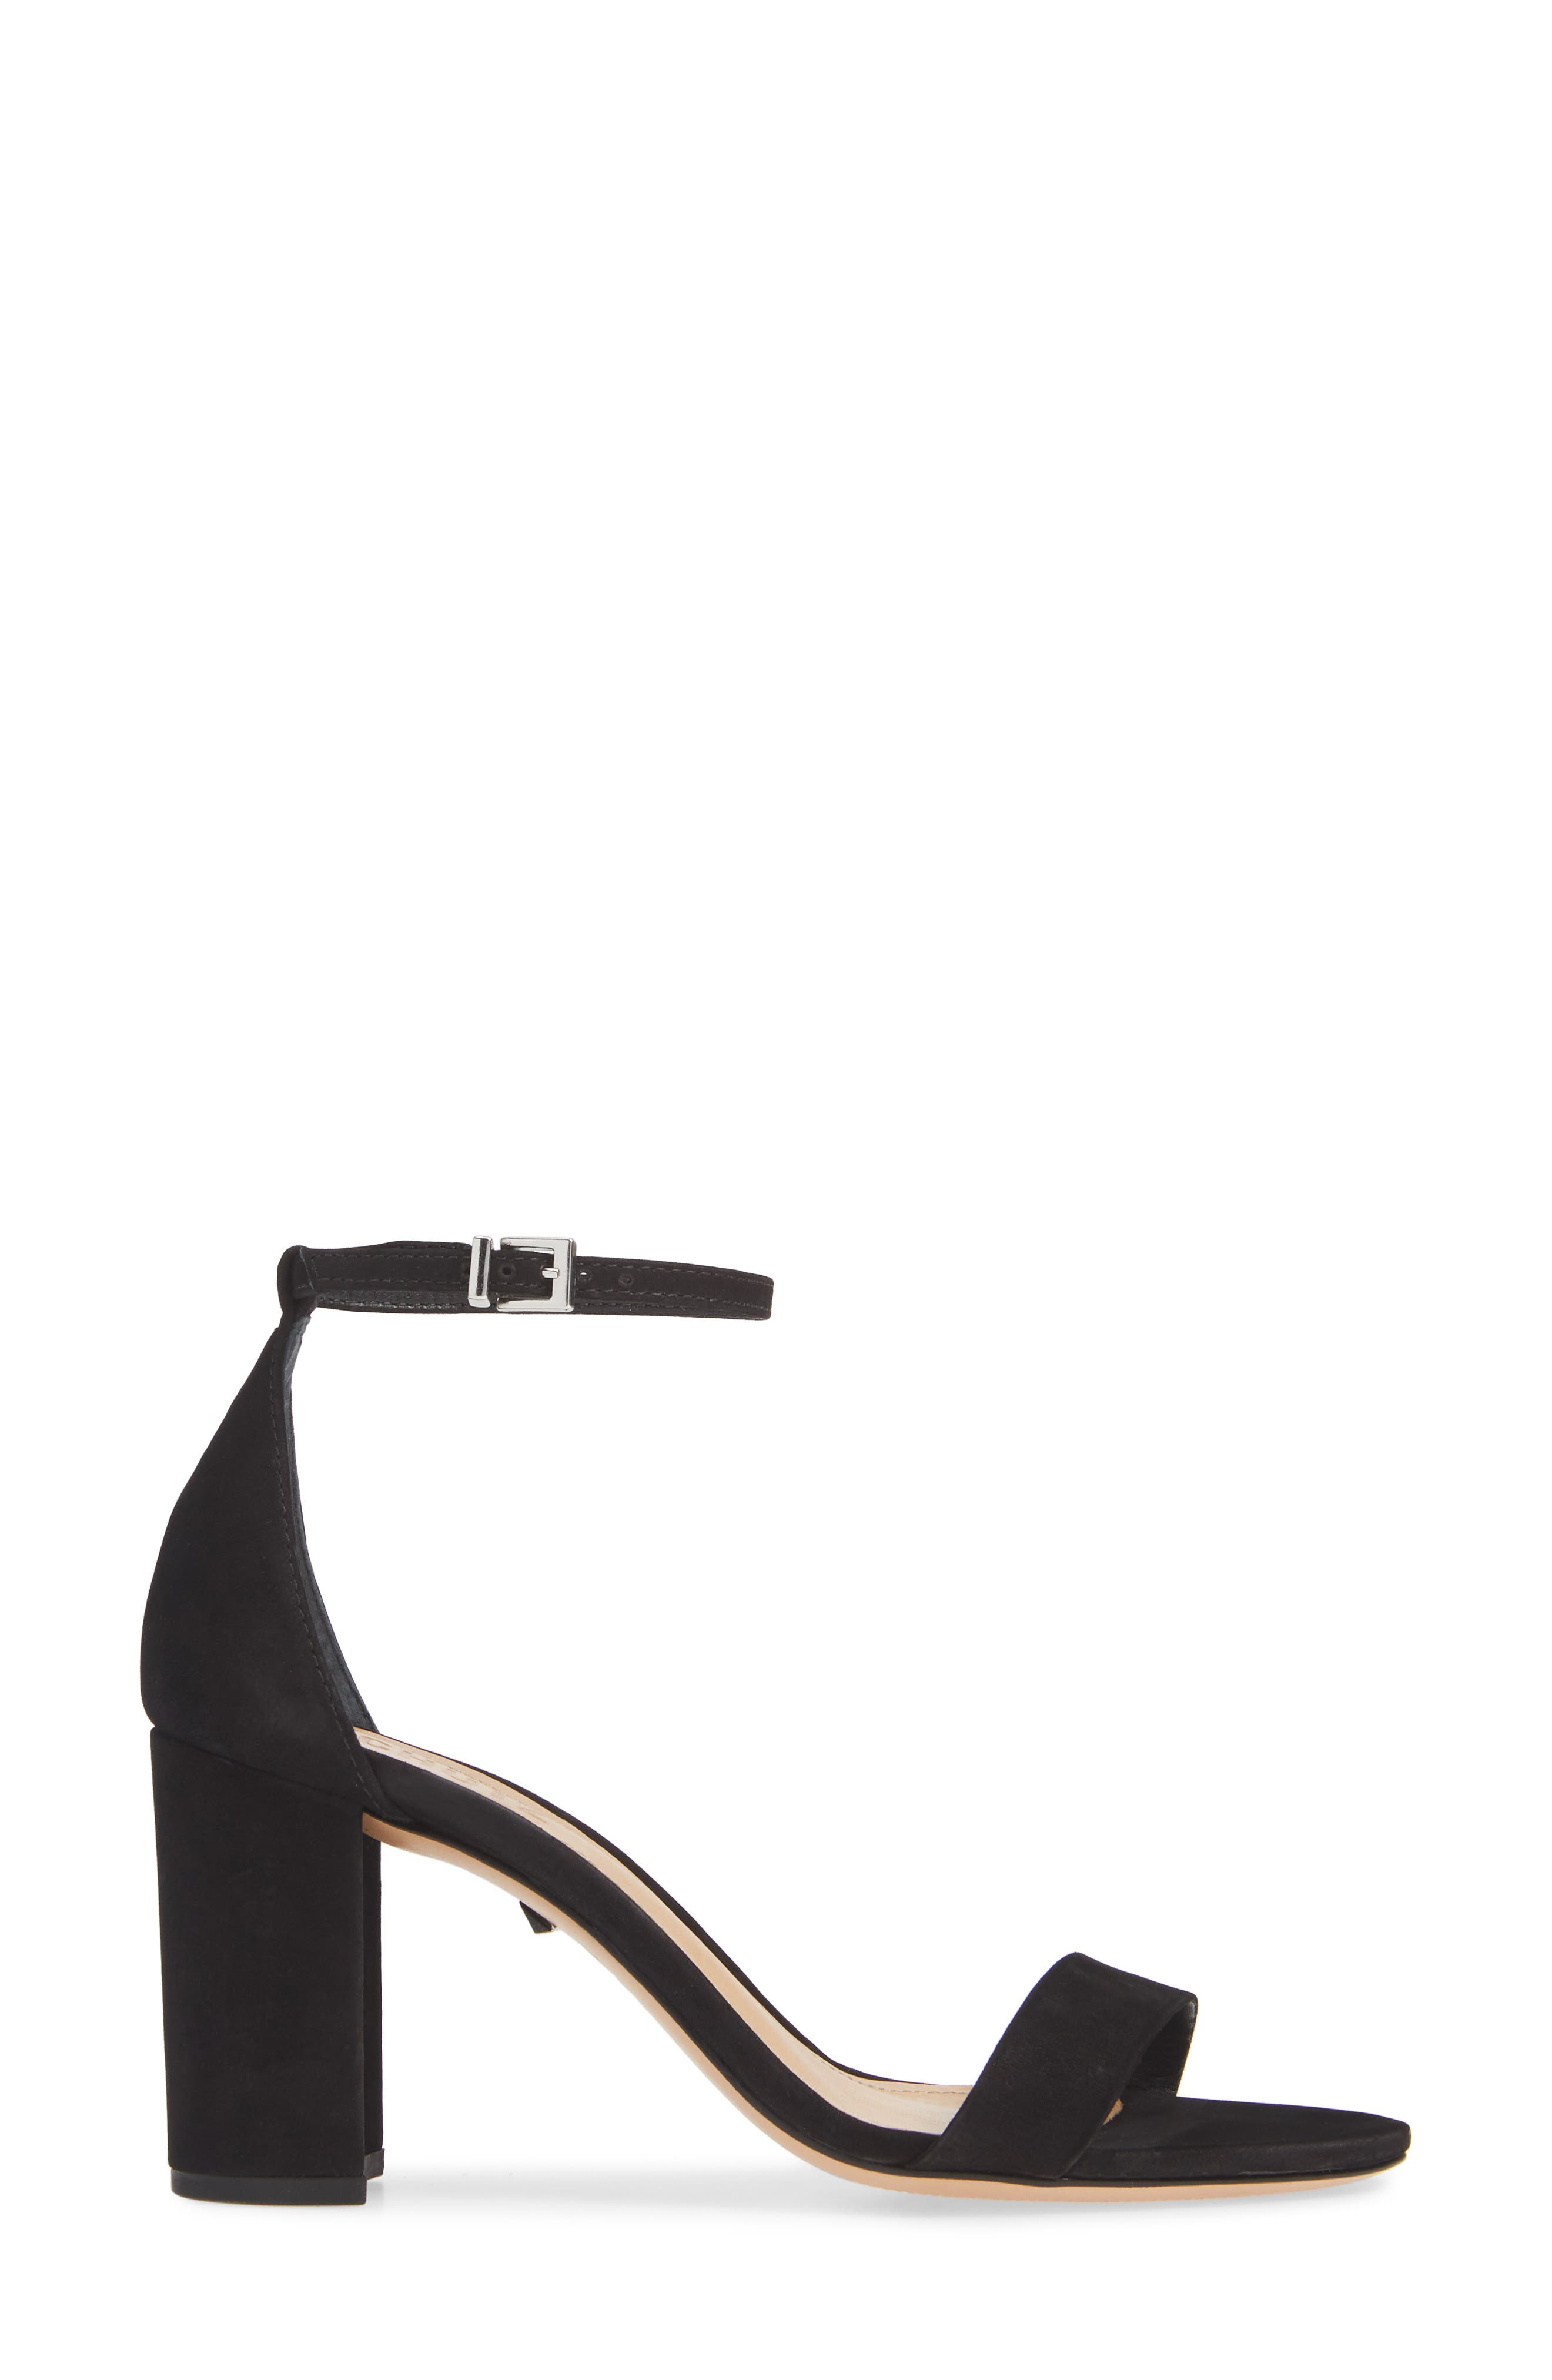 Anna Lee Ankle Strap Sandal,                             Alternate thumbnail 3, color,                             BLACK NUBUCK LEATHER